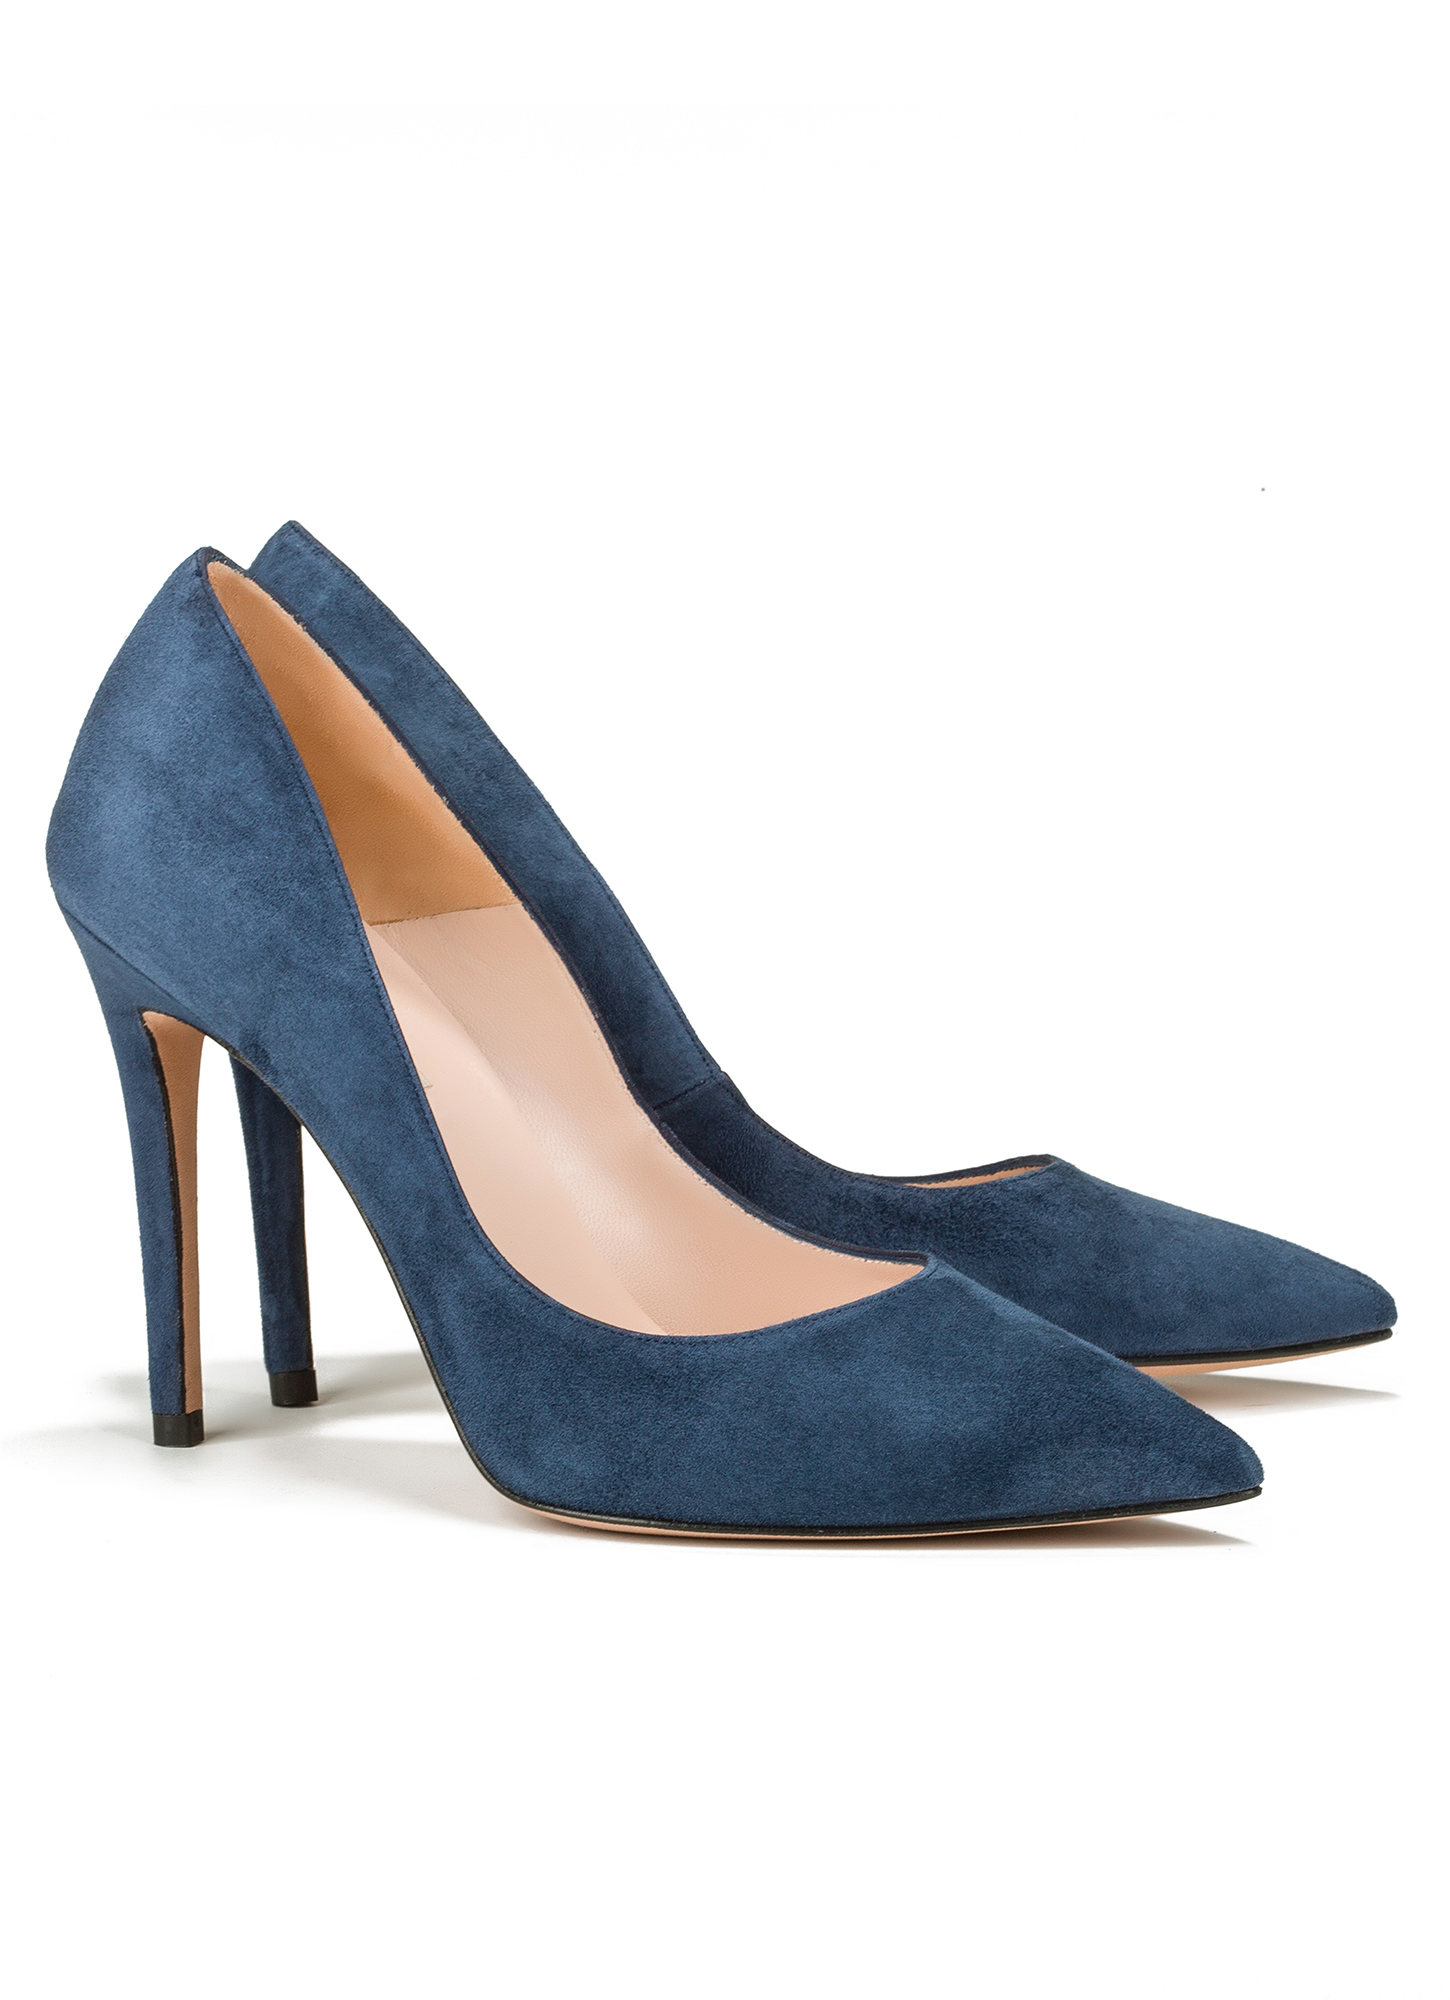 e9321fefca5c38 Red High Heels For Women